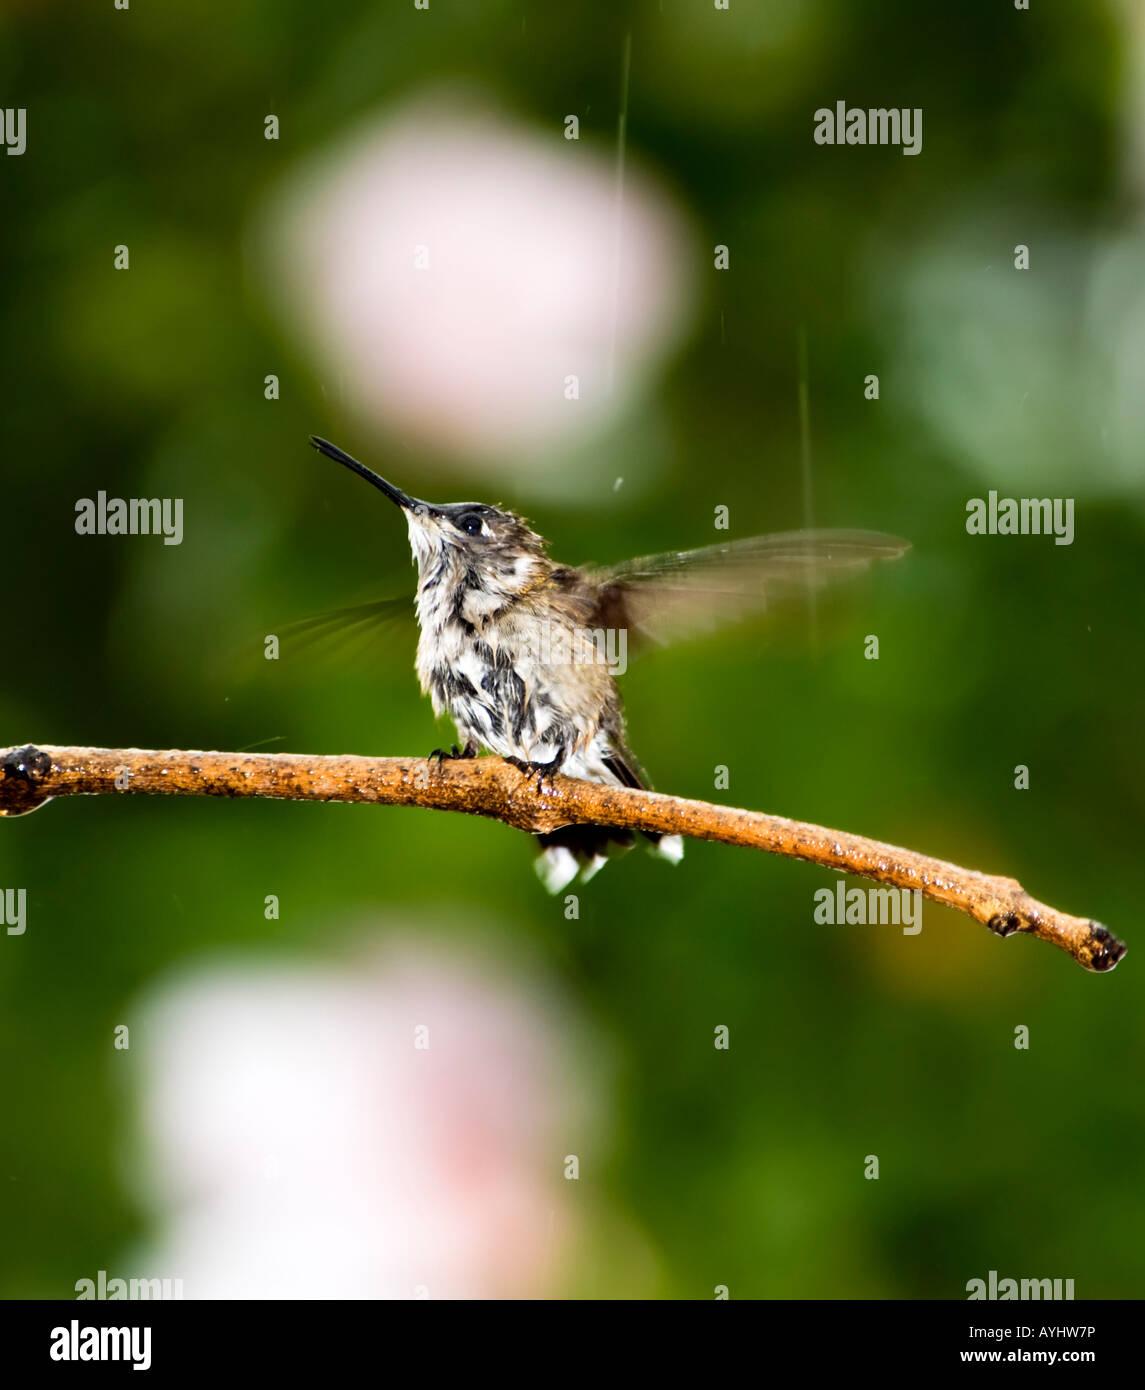 a-female-ruby-throated-hummingbird-archo